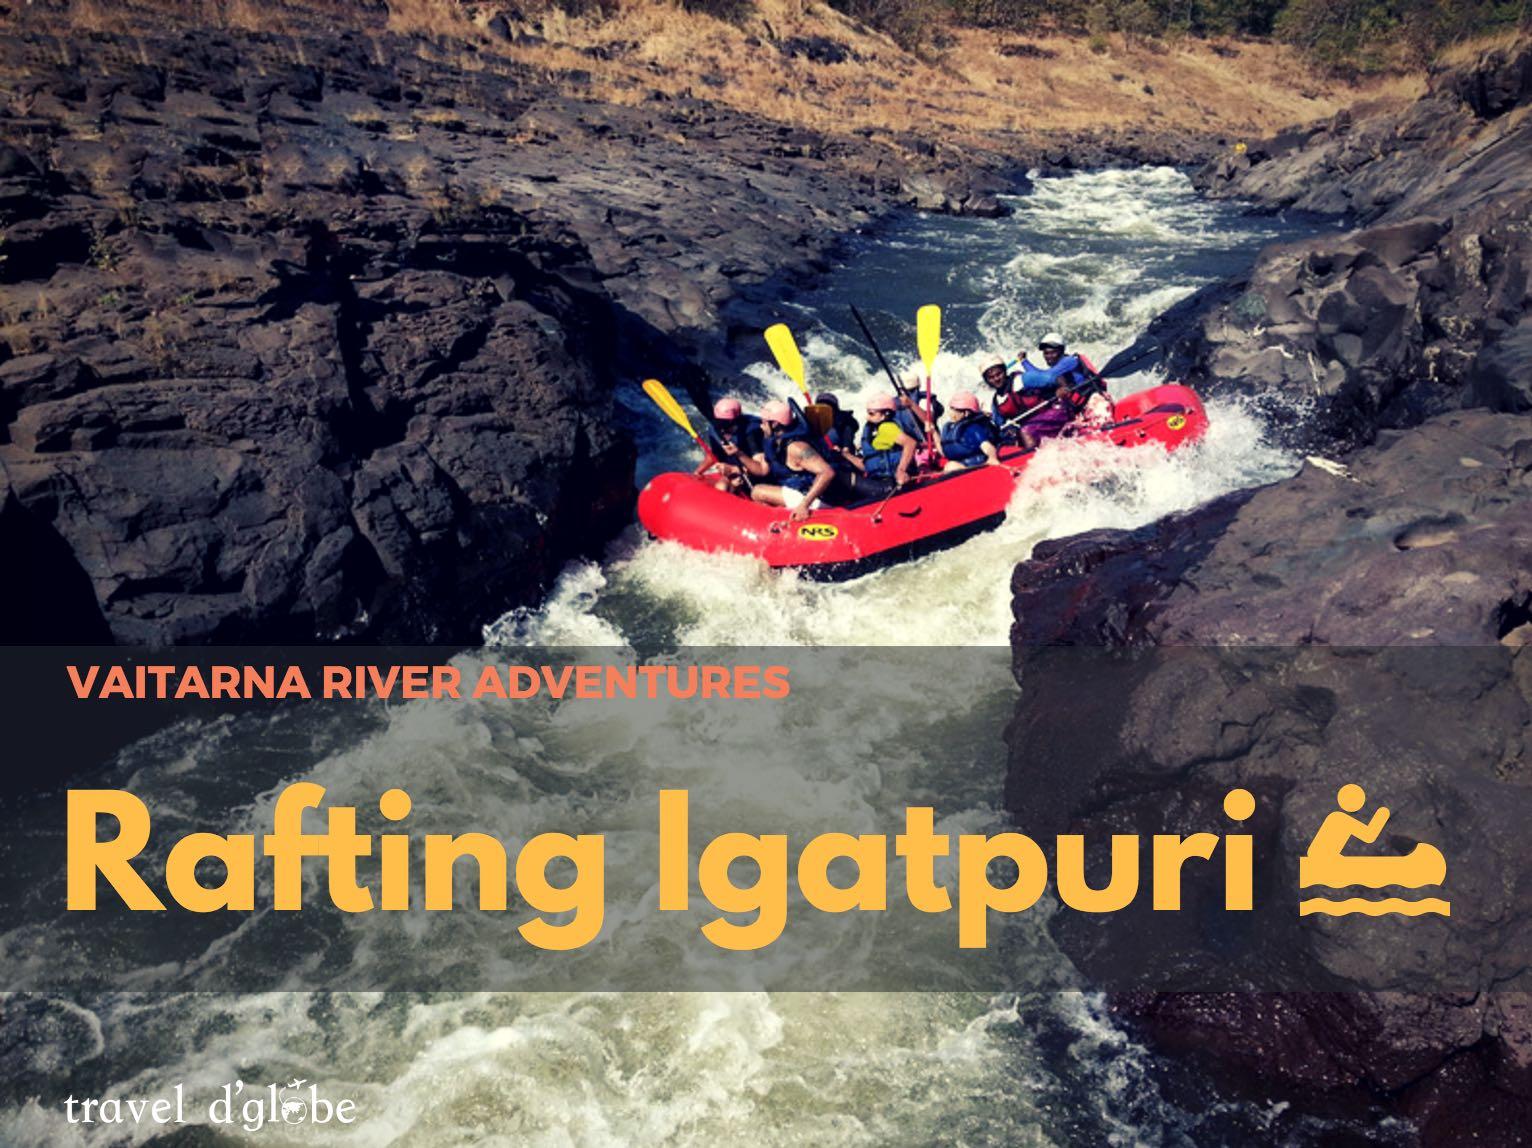 River Rafting in Igatpuri